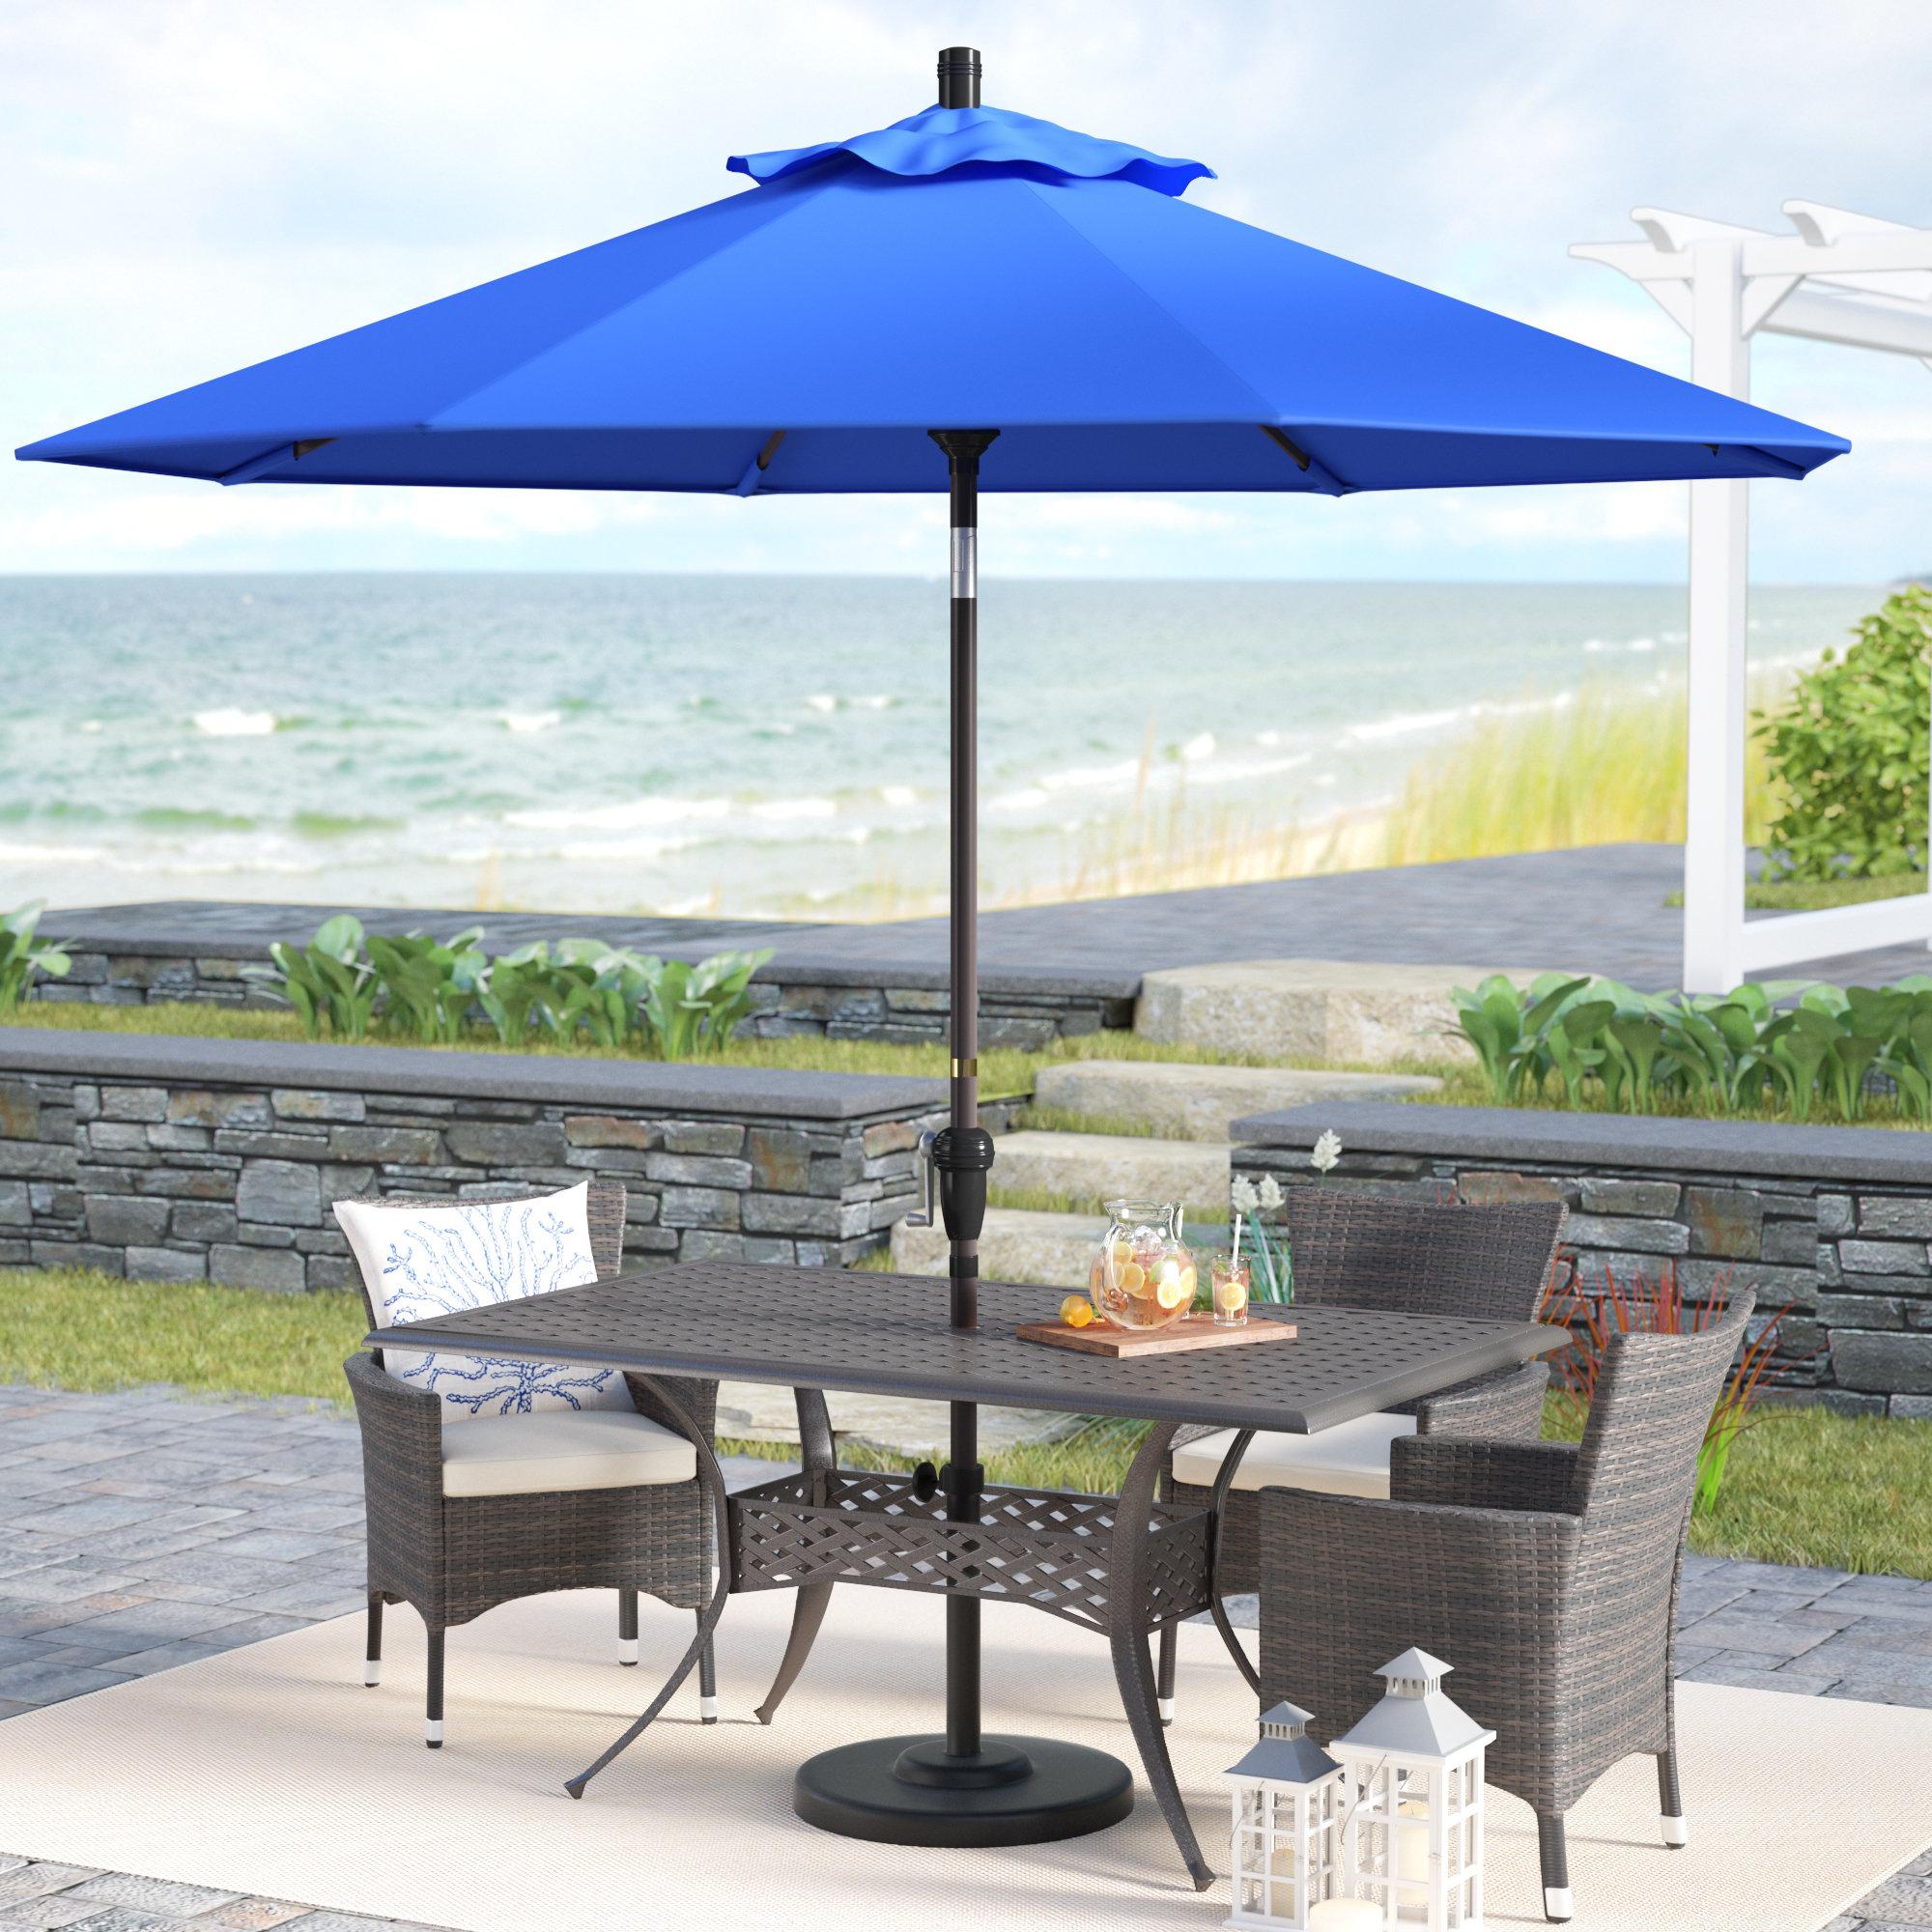 Mullaney 9' Market Sunbrella Umbrella Pertaining To Well Known Mullaney Market Umbrellas (View 8 of 20)